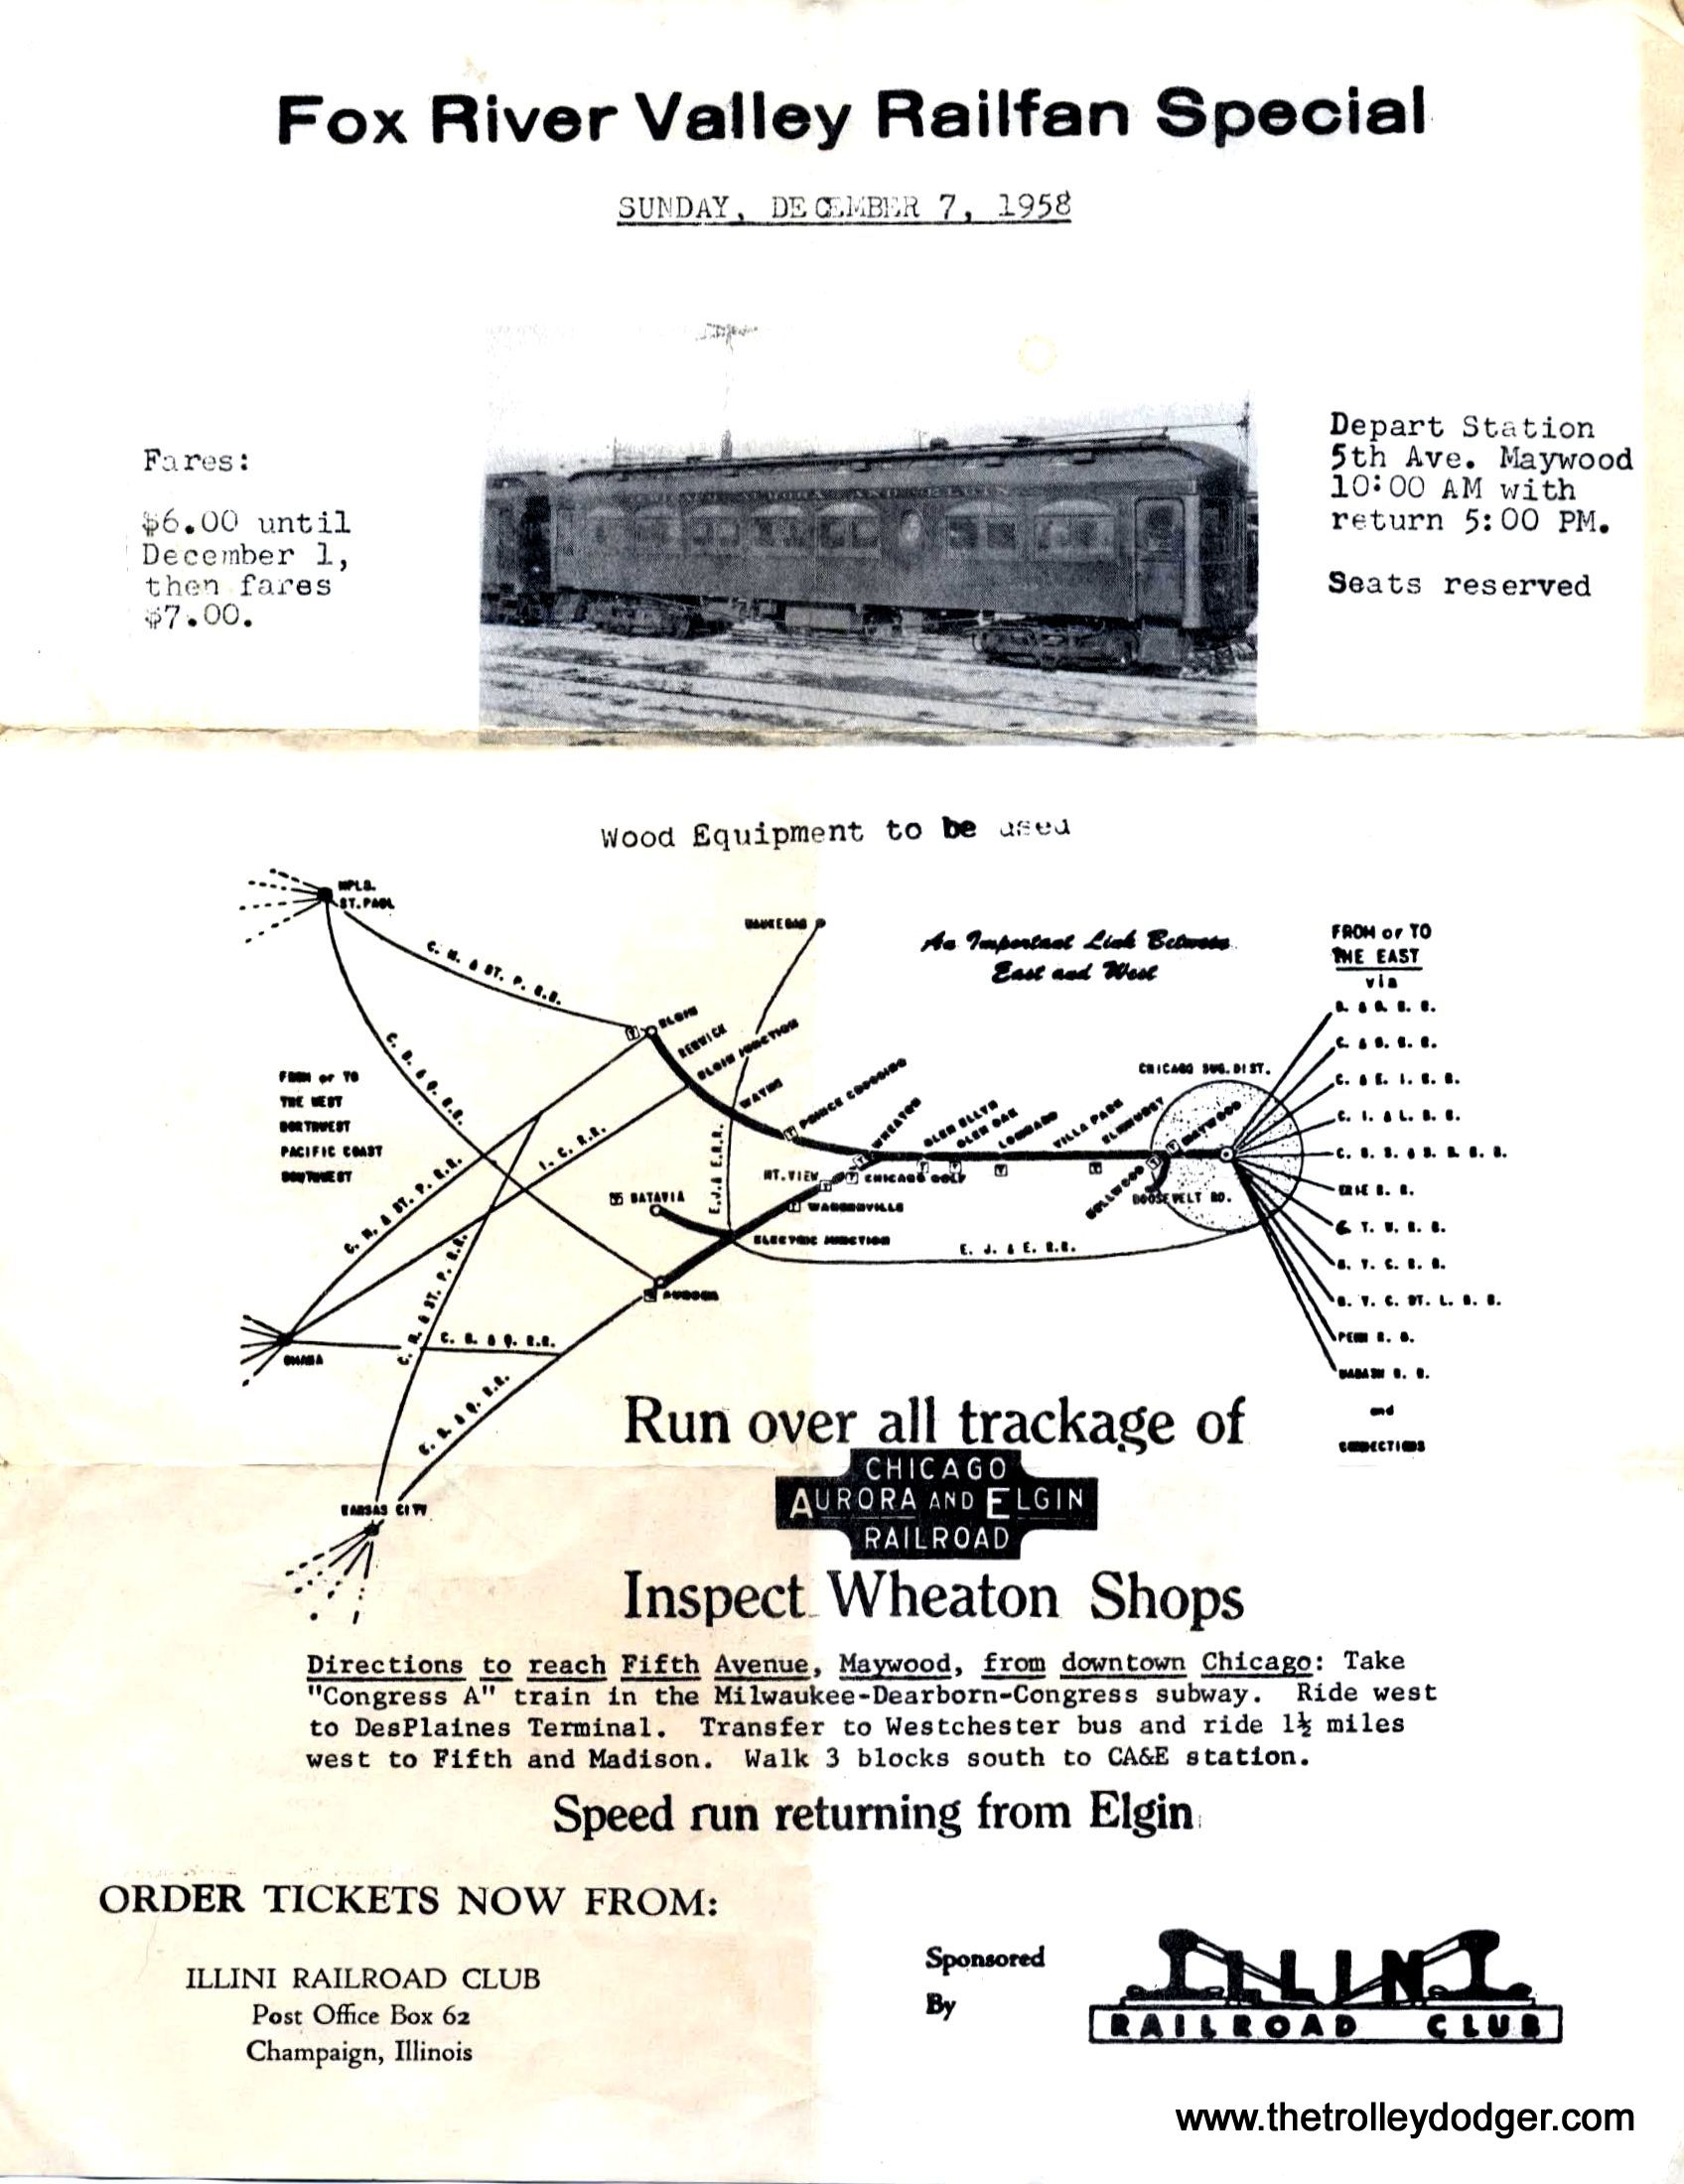 cae151?w=665&h=863 illinois prairie path the trolley dodger Aurora Borealis Diagram at fashall.co